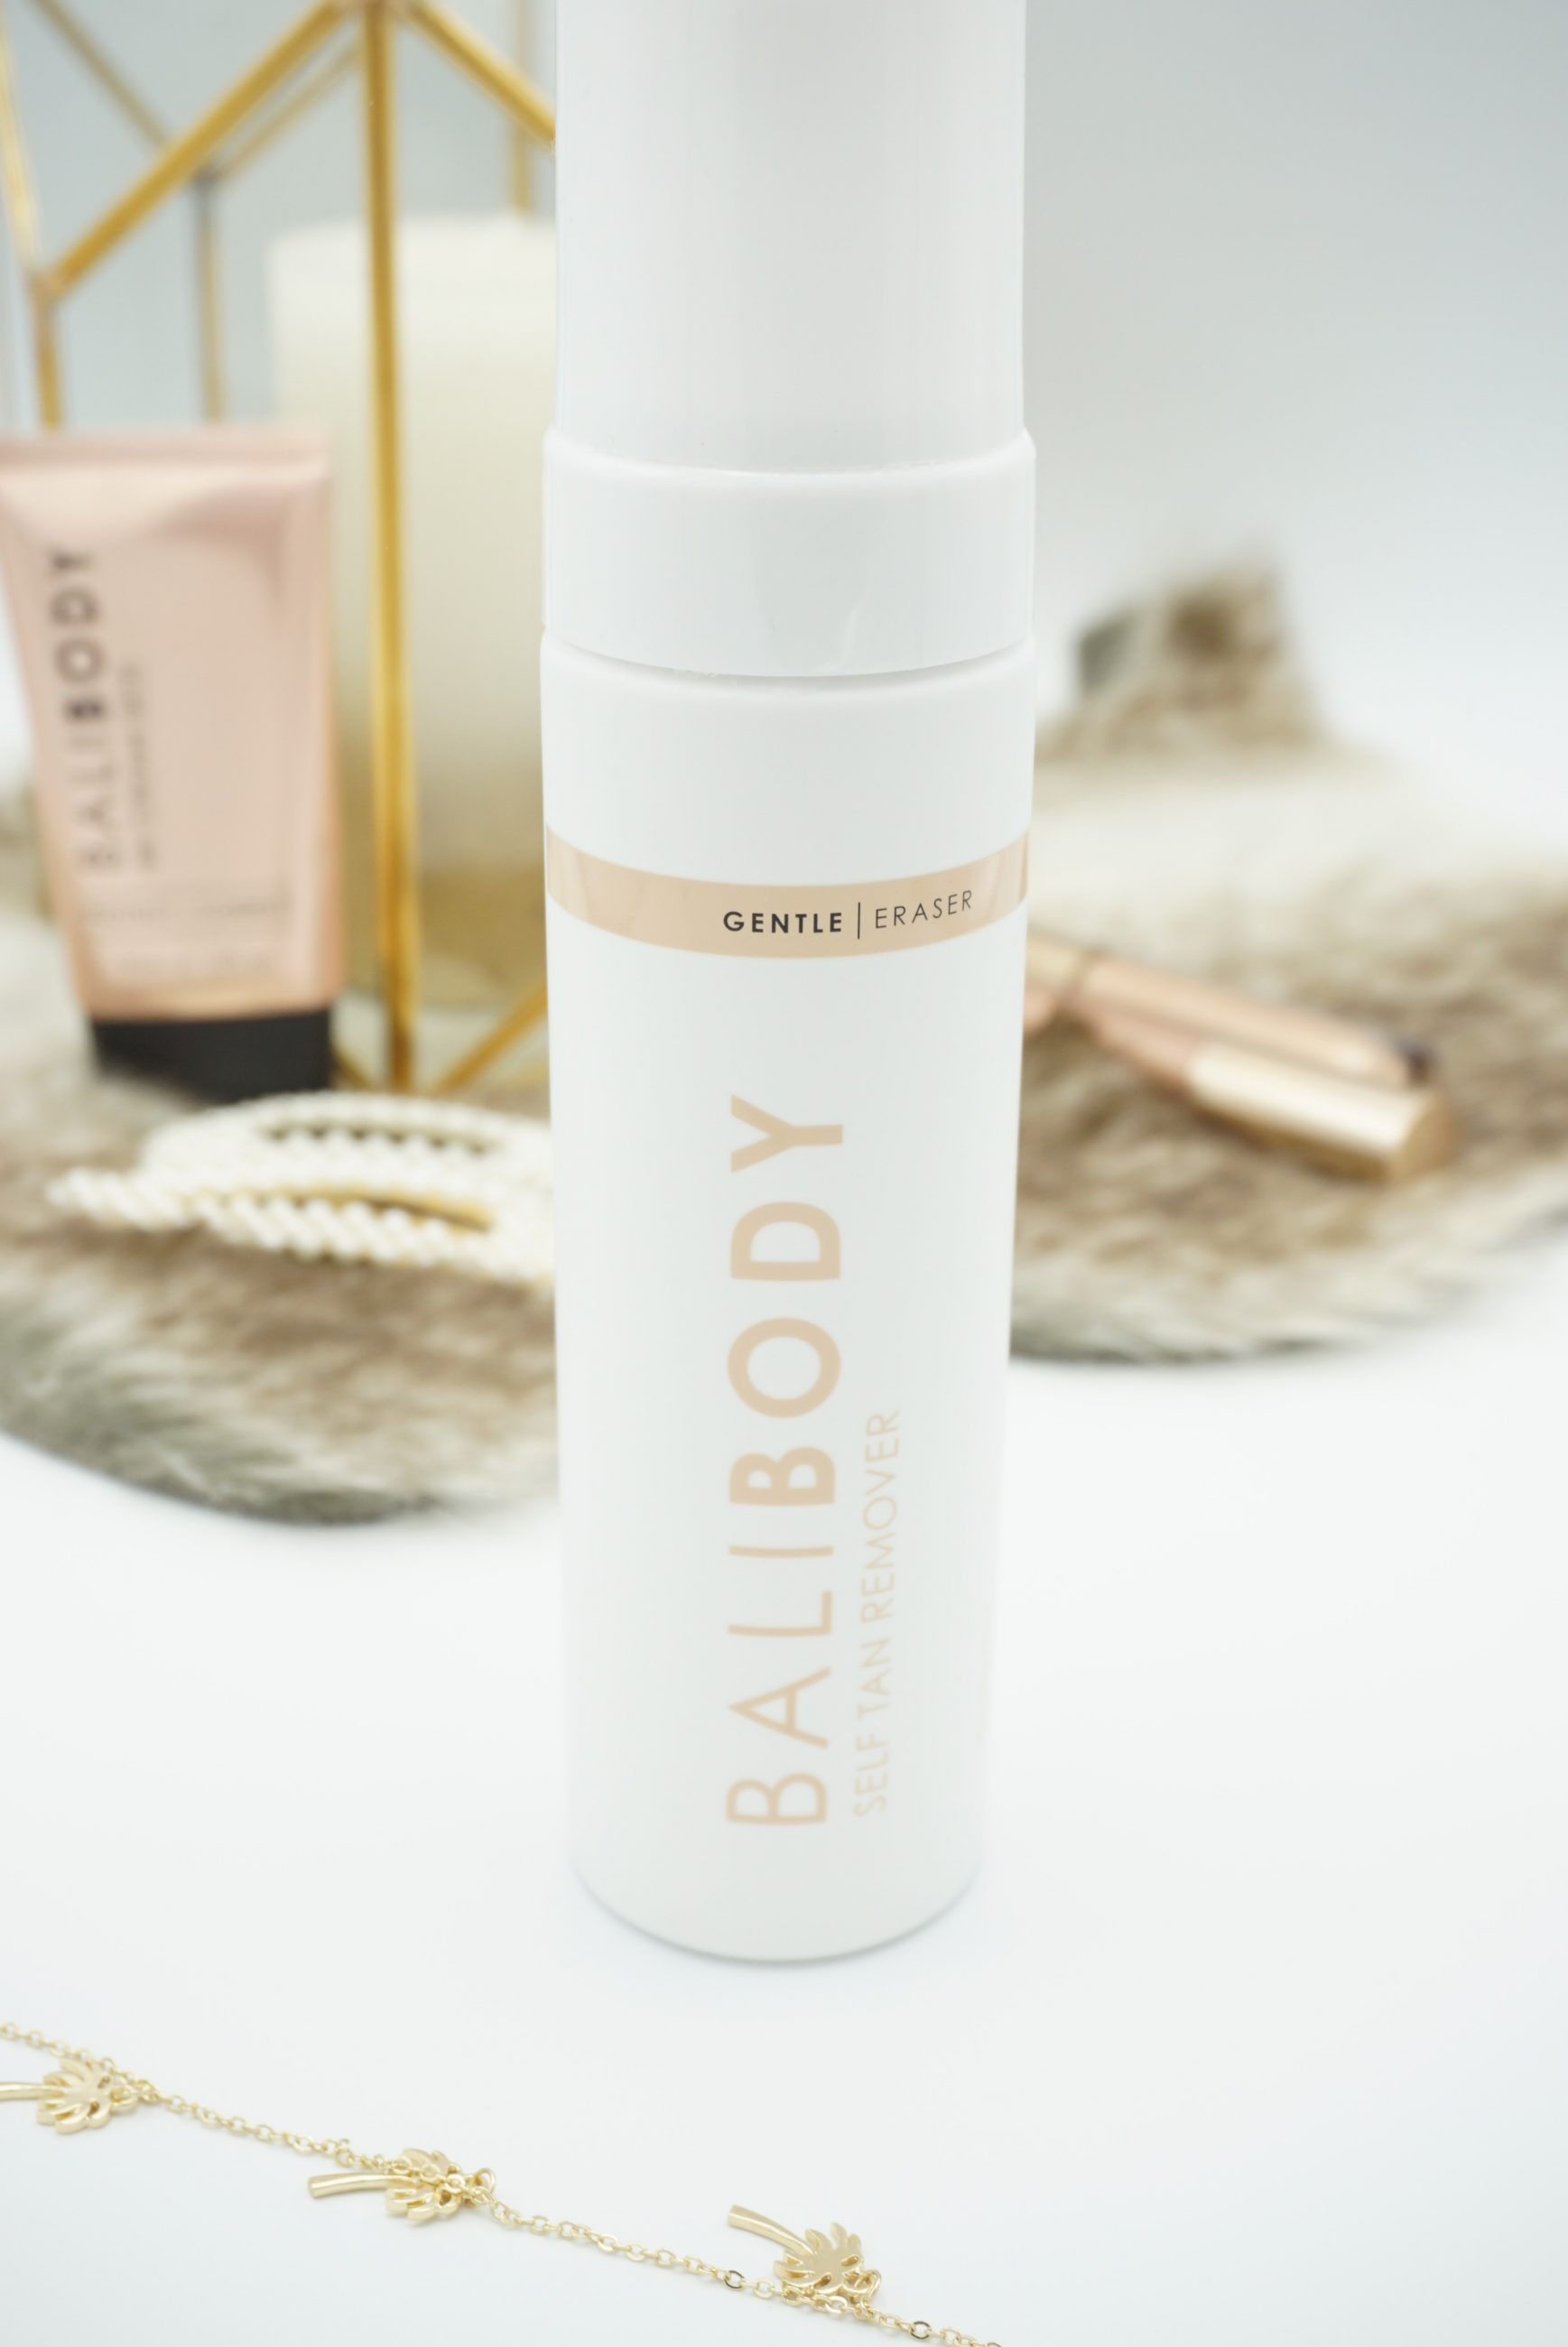 Bali Body Self Tan Remover Review